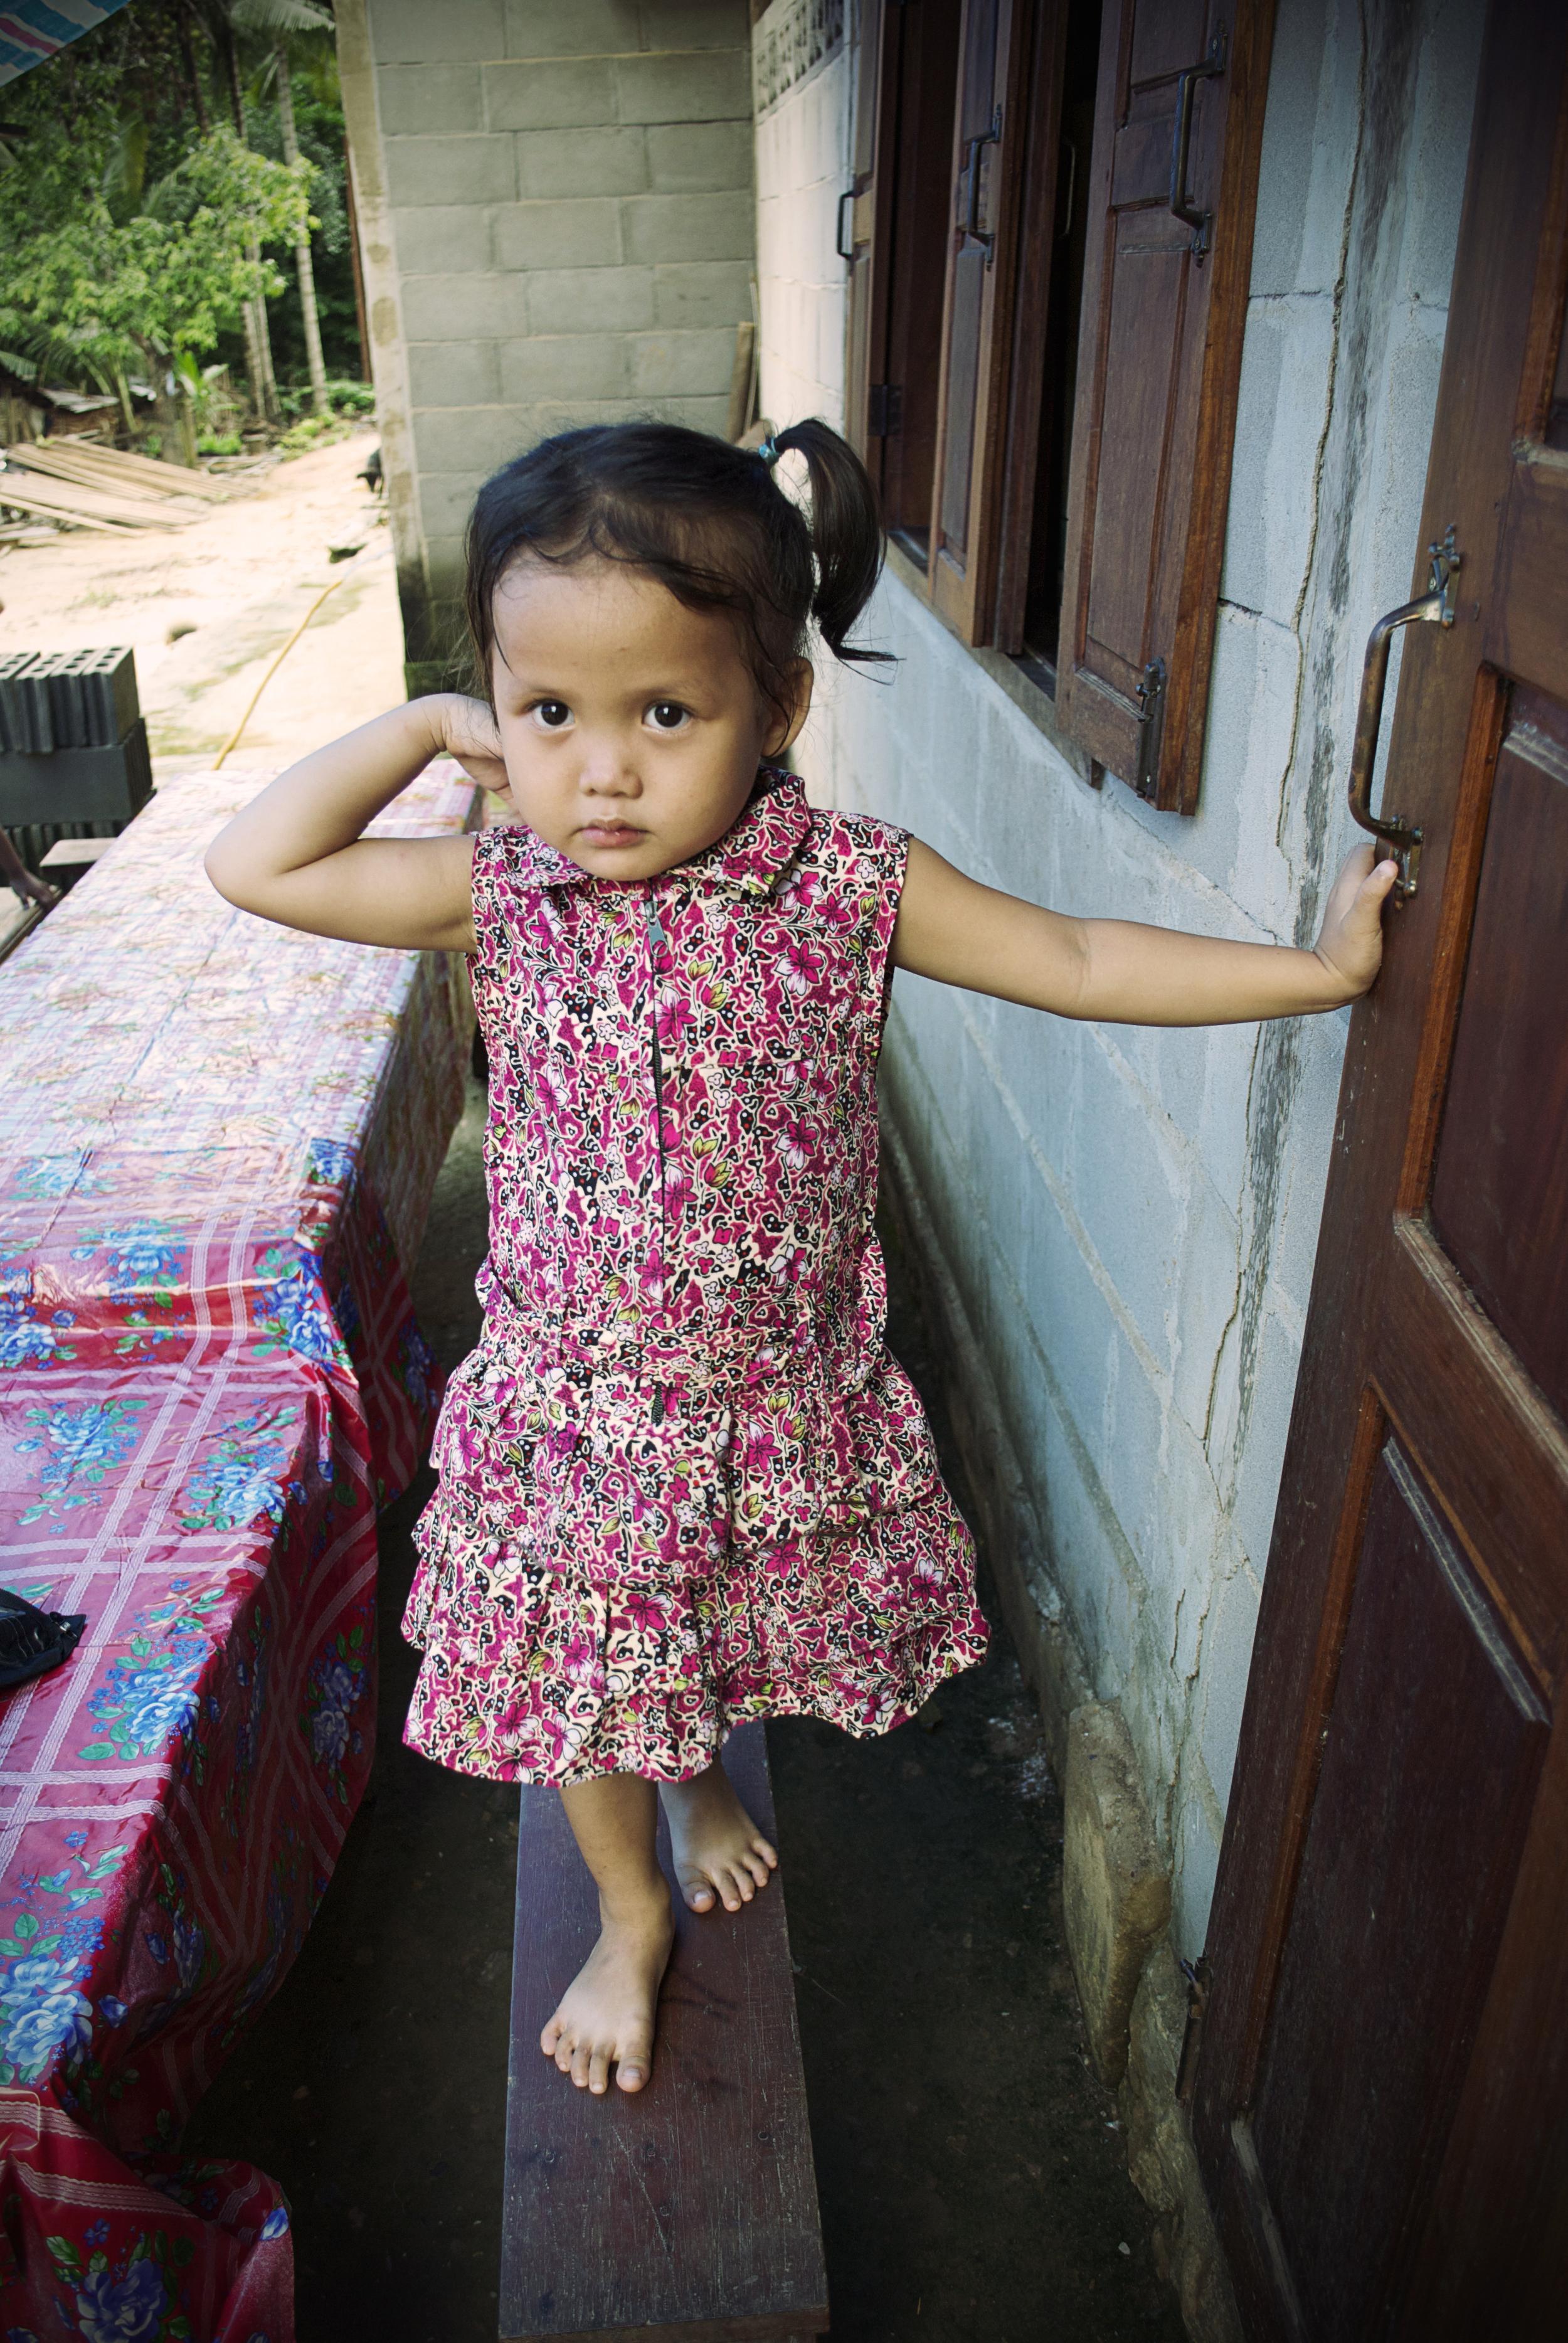 PORTRAITS | Girl on Bench, Ban Lad Khammoune, Laos